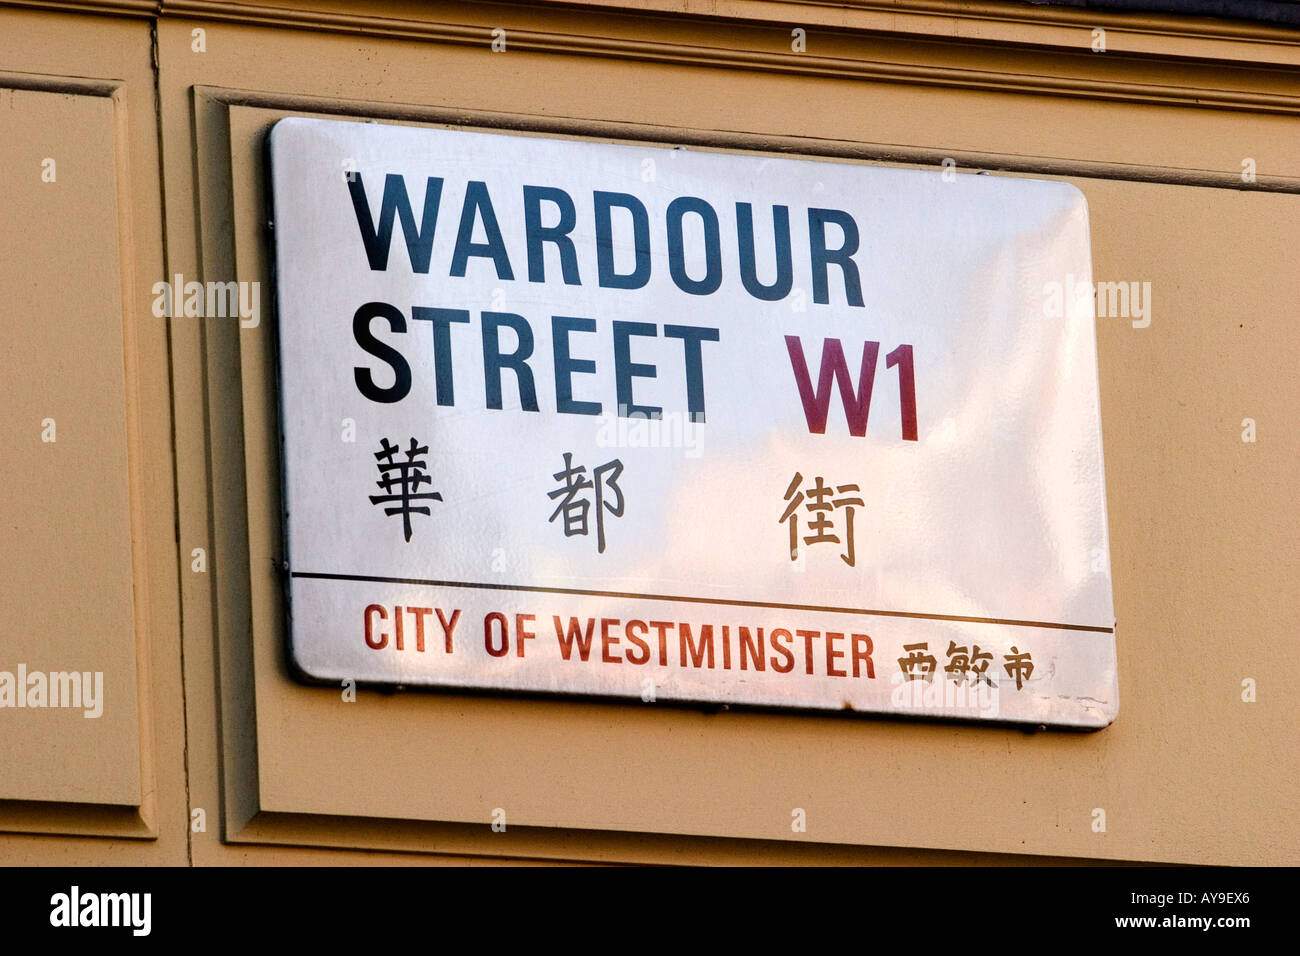 wardour street sign street london england - Stock Image